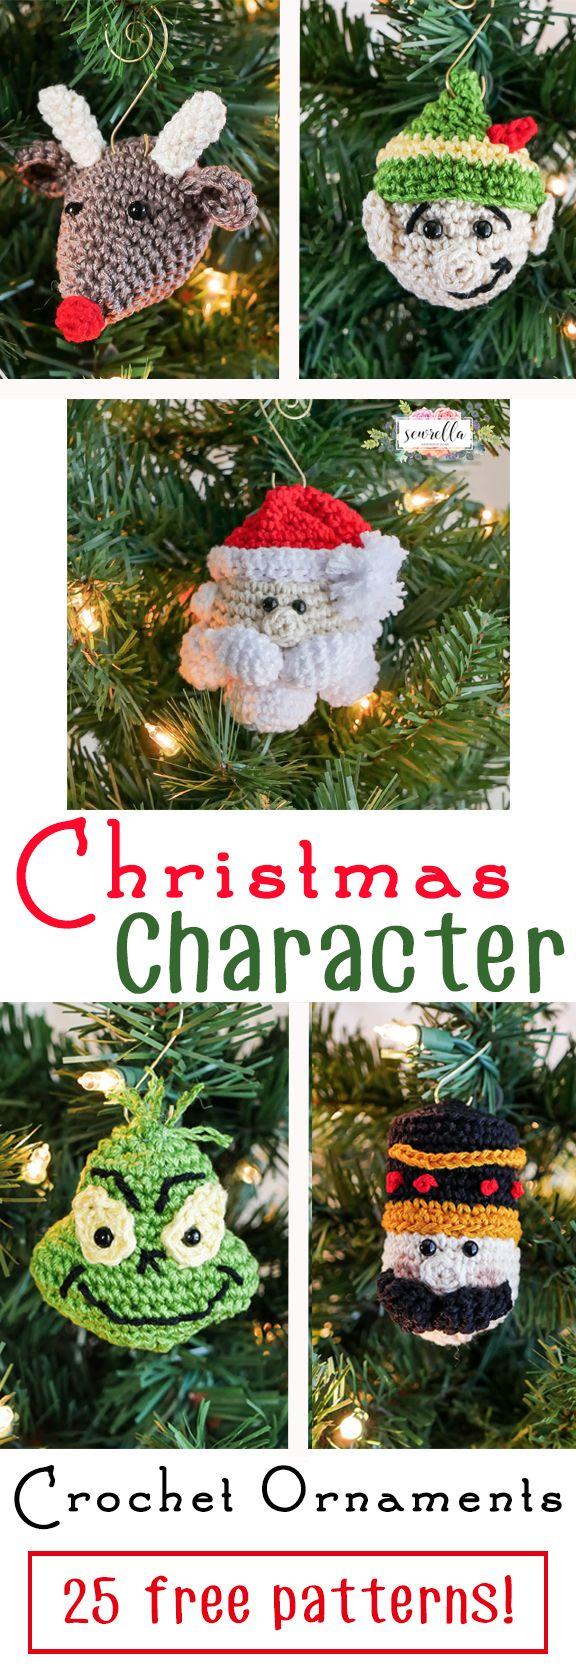 Christmas Character Crochet Ornaments | 25 Days of Christmas ...